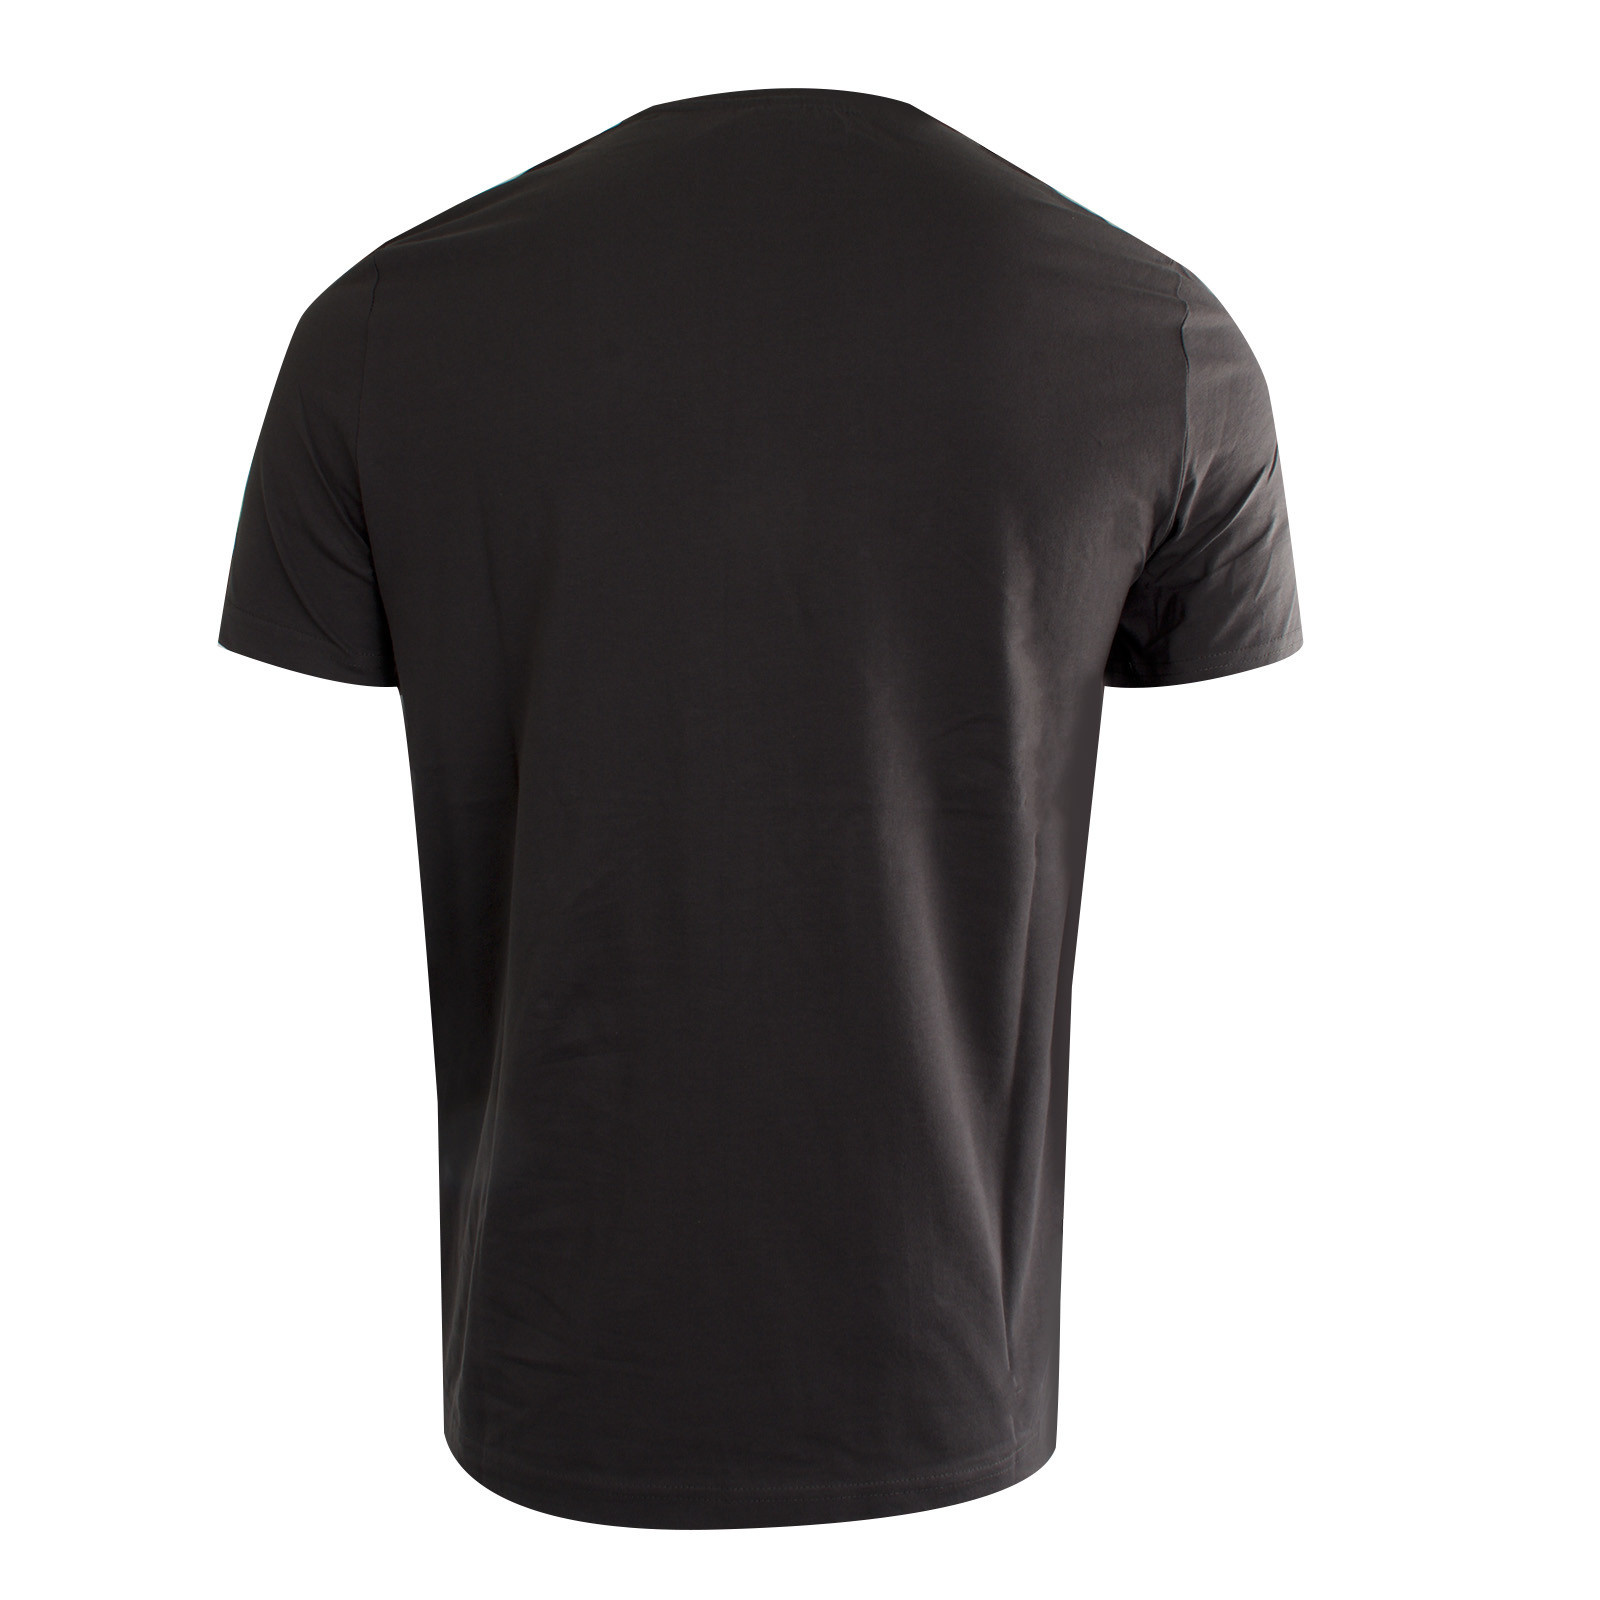 RAFC T-shirt Dark Grey-2